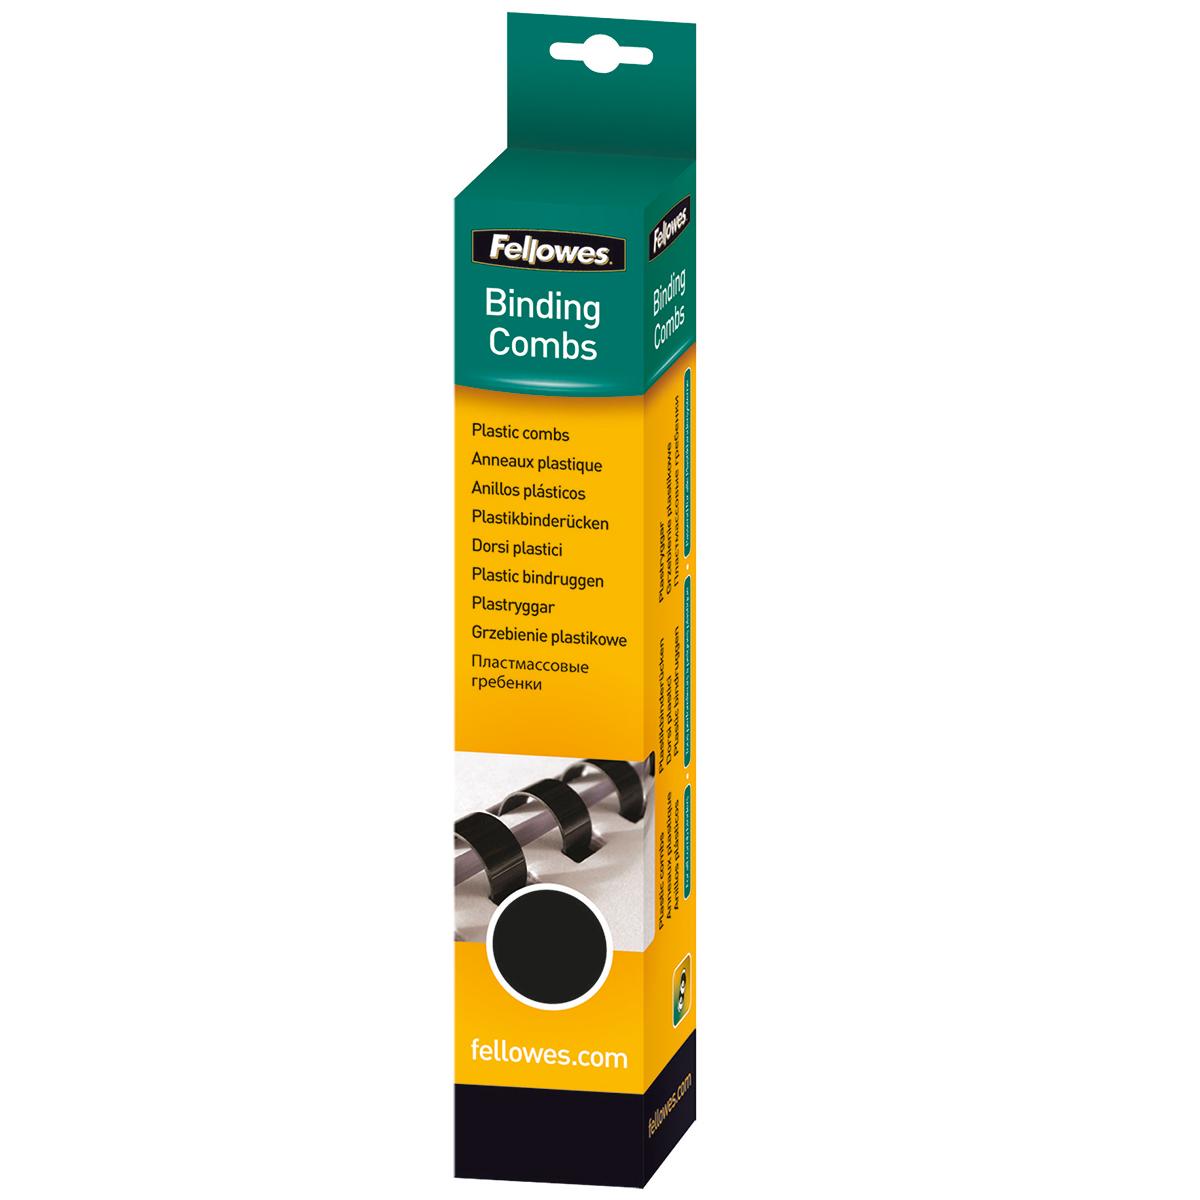 Fellowes 5331102 10mm Black Comb 25pk